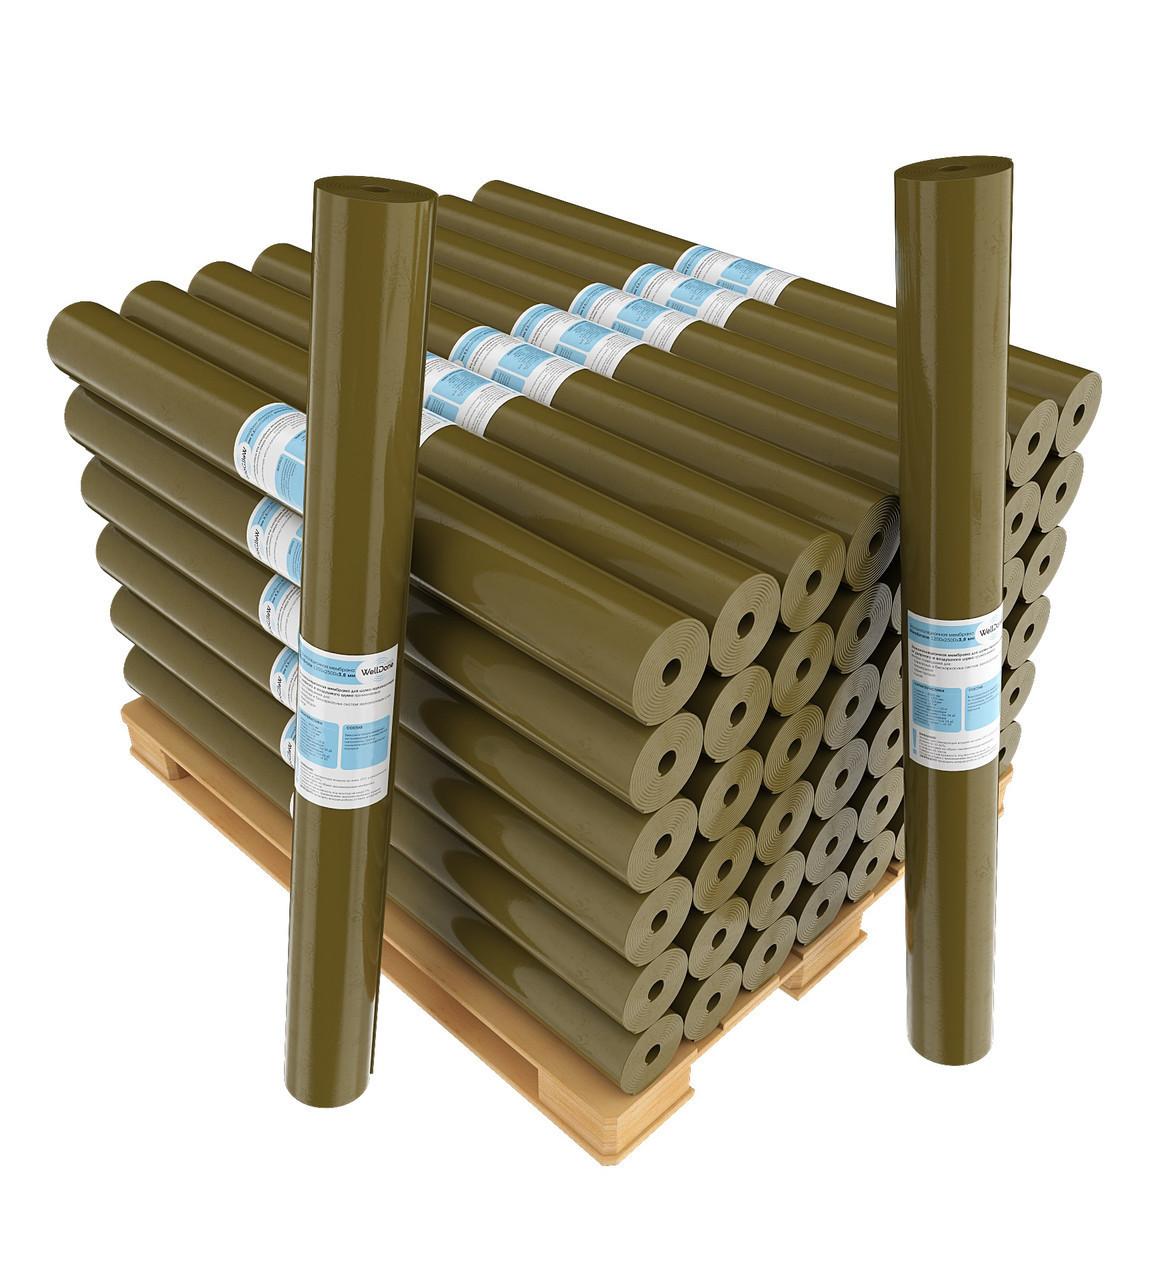 Самоклеющаяся мембрана для звукоизоляции стен и потолка Welldone membrane 3.8 S